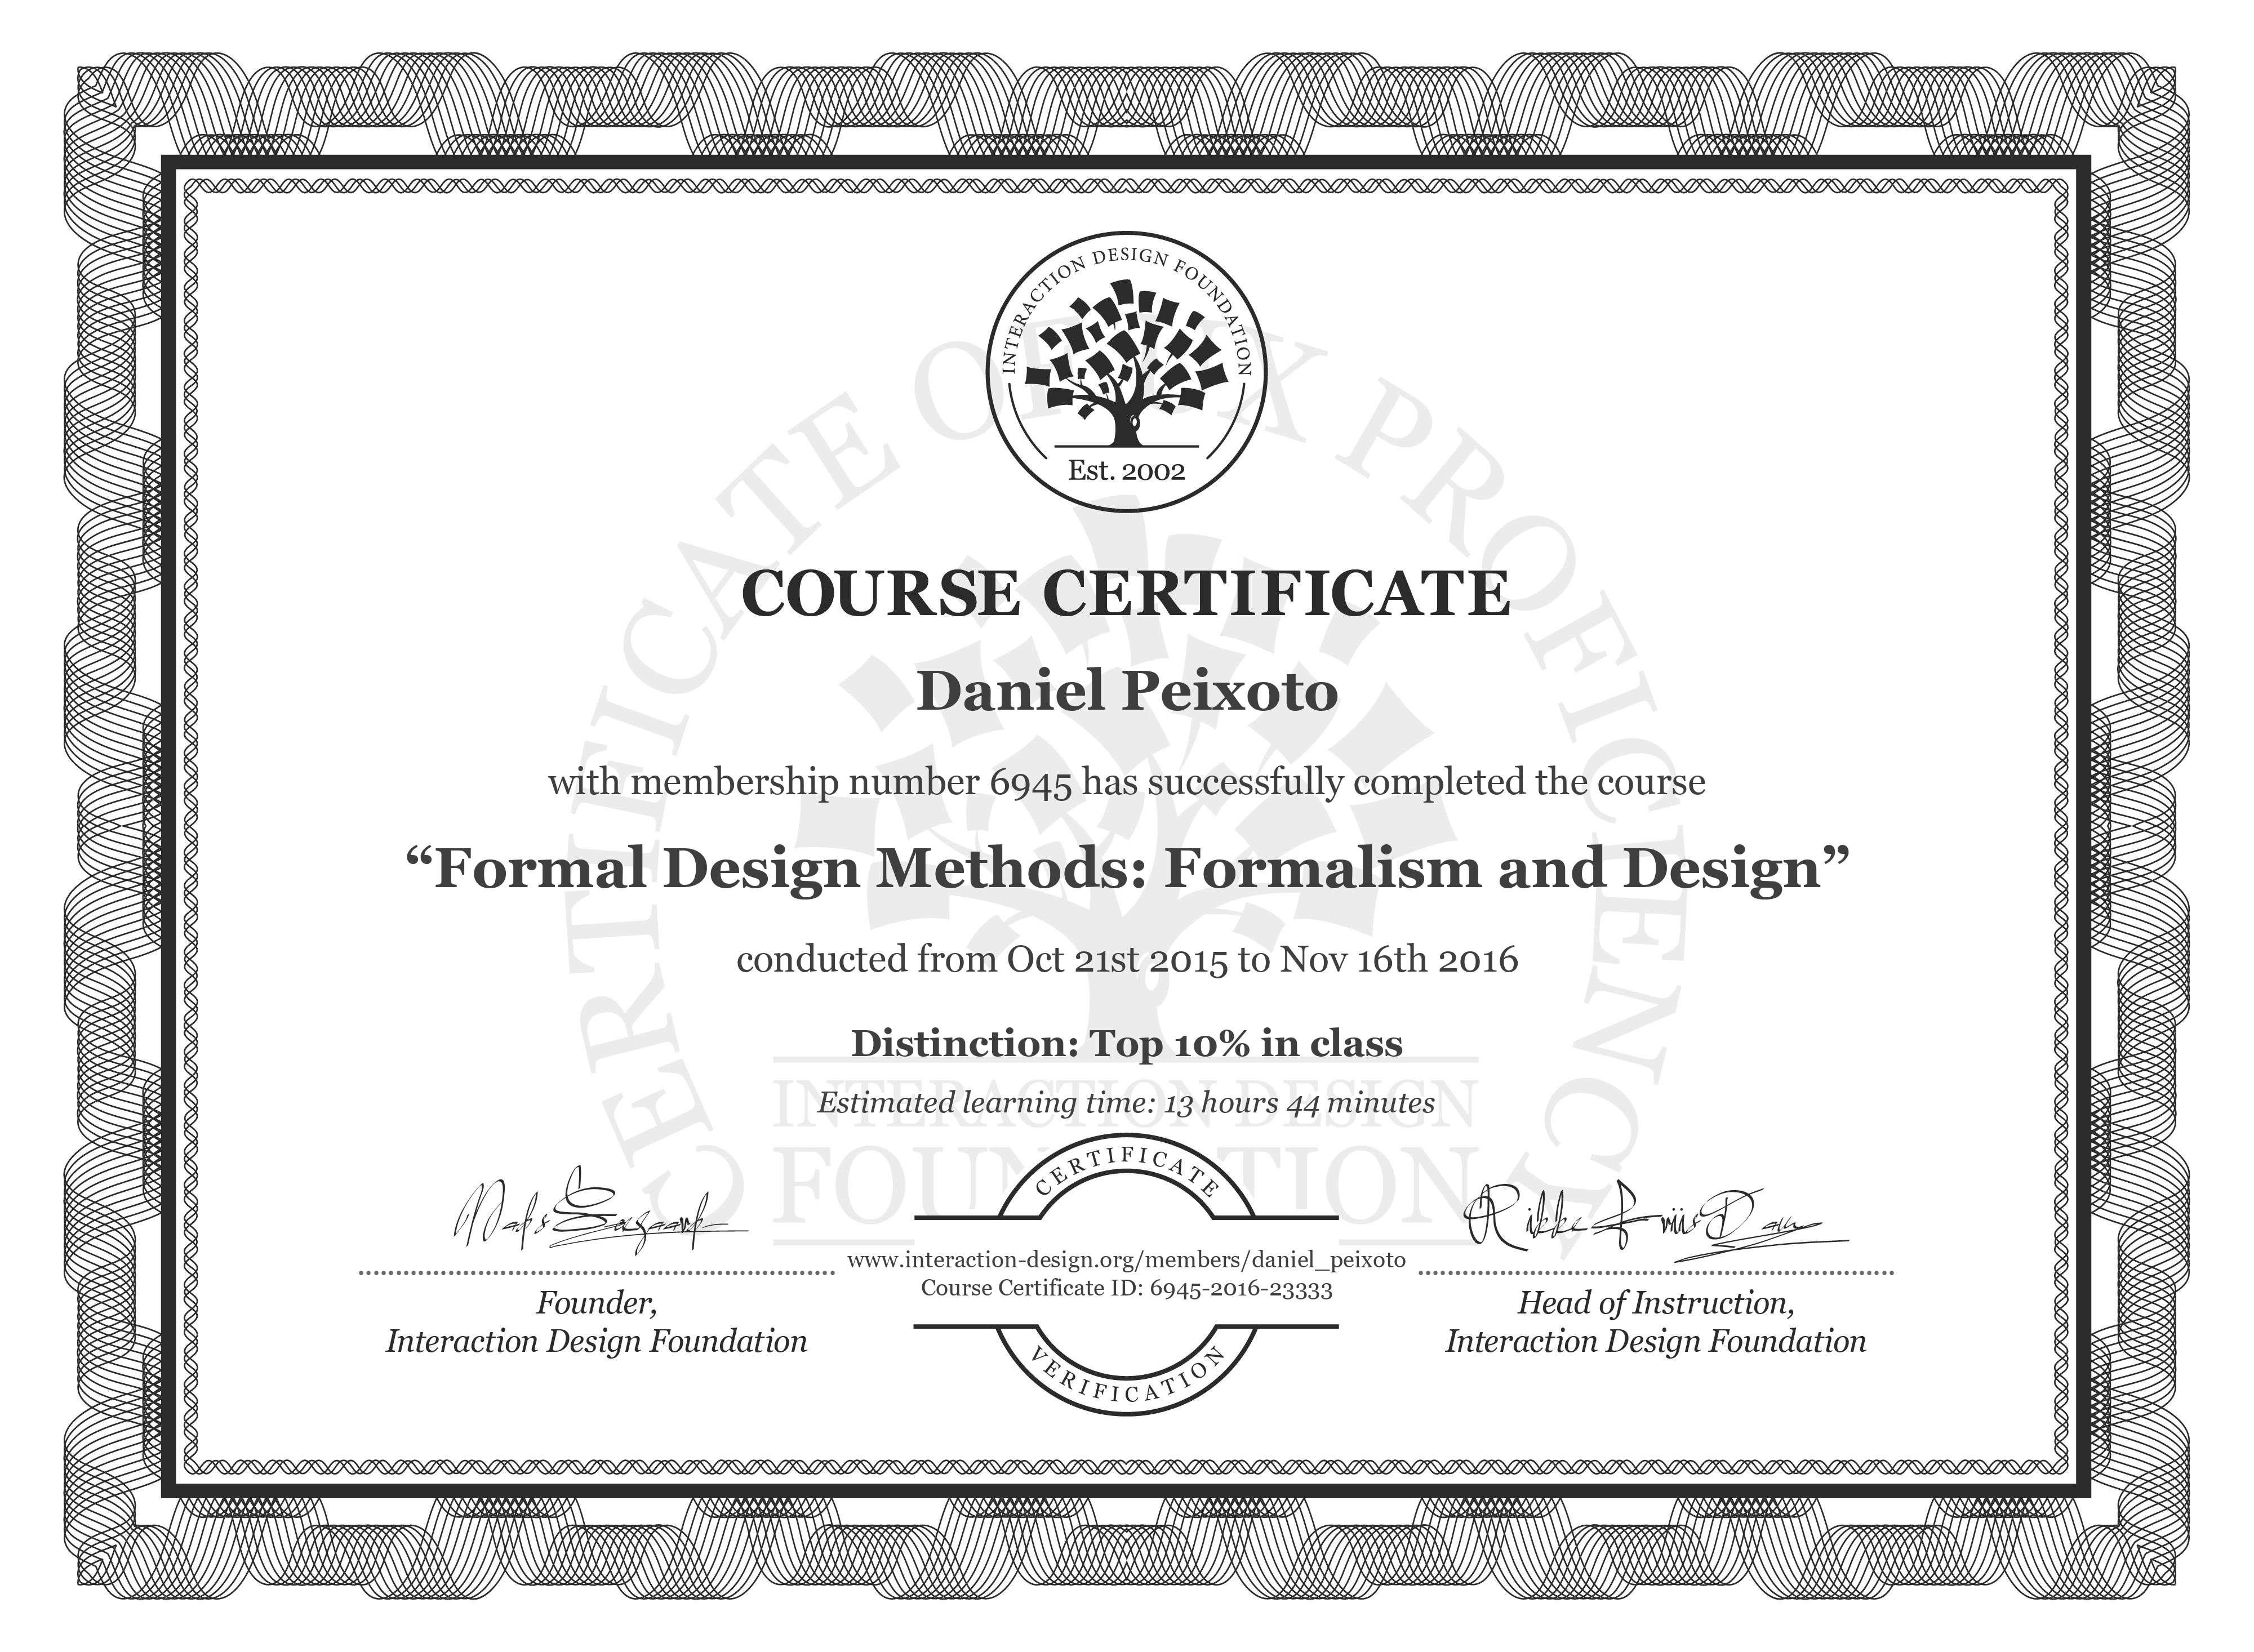 Daniel Peixoto's Course Certificate: Formal Design Methods: Formalism and Design